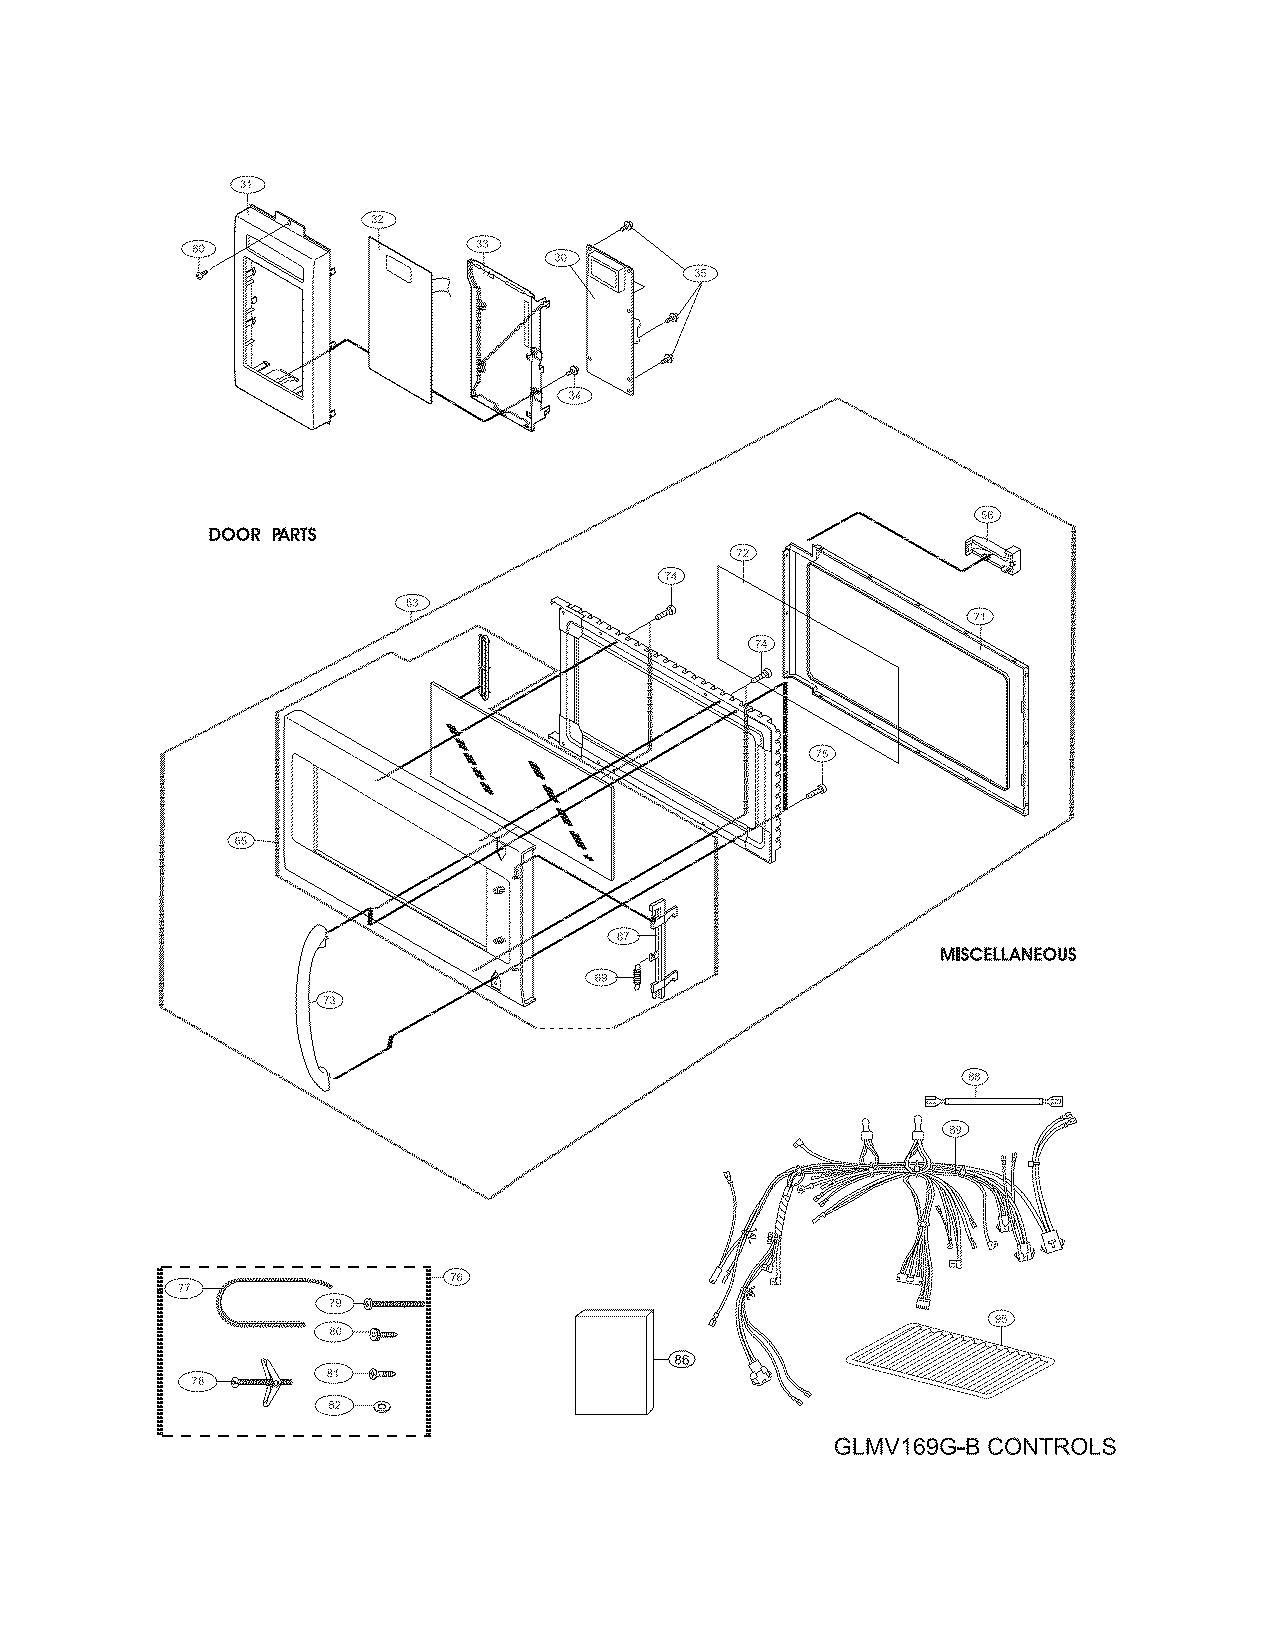 Frigidaire model PLMVZ169GCC microwave/hood combo genuine